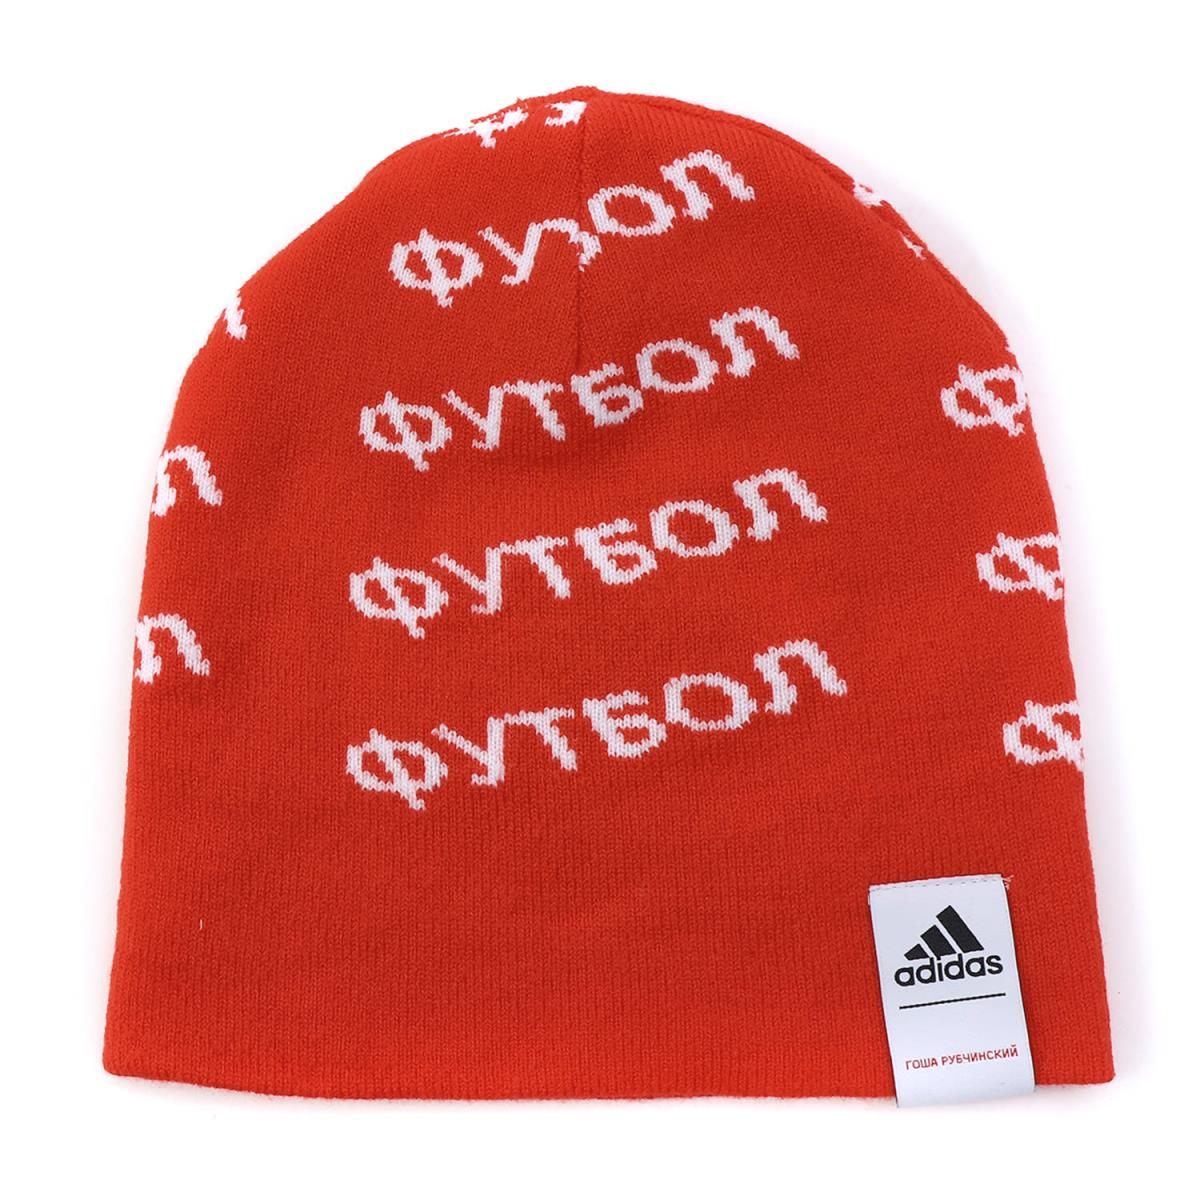 Gosha Rubchinskiy (go Schalla butyne ski) 17A W X adidas monogram logo knit  beanie red 9b93dab8356f